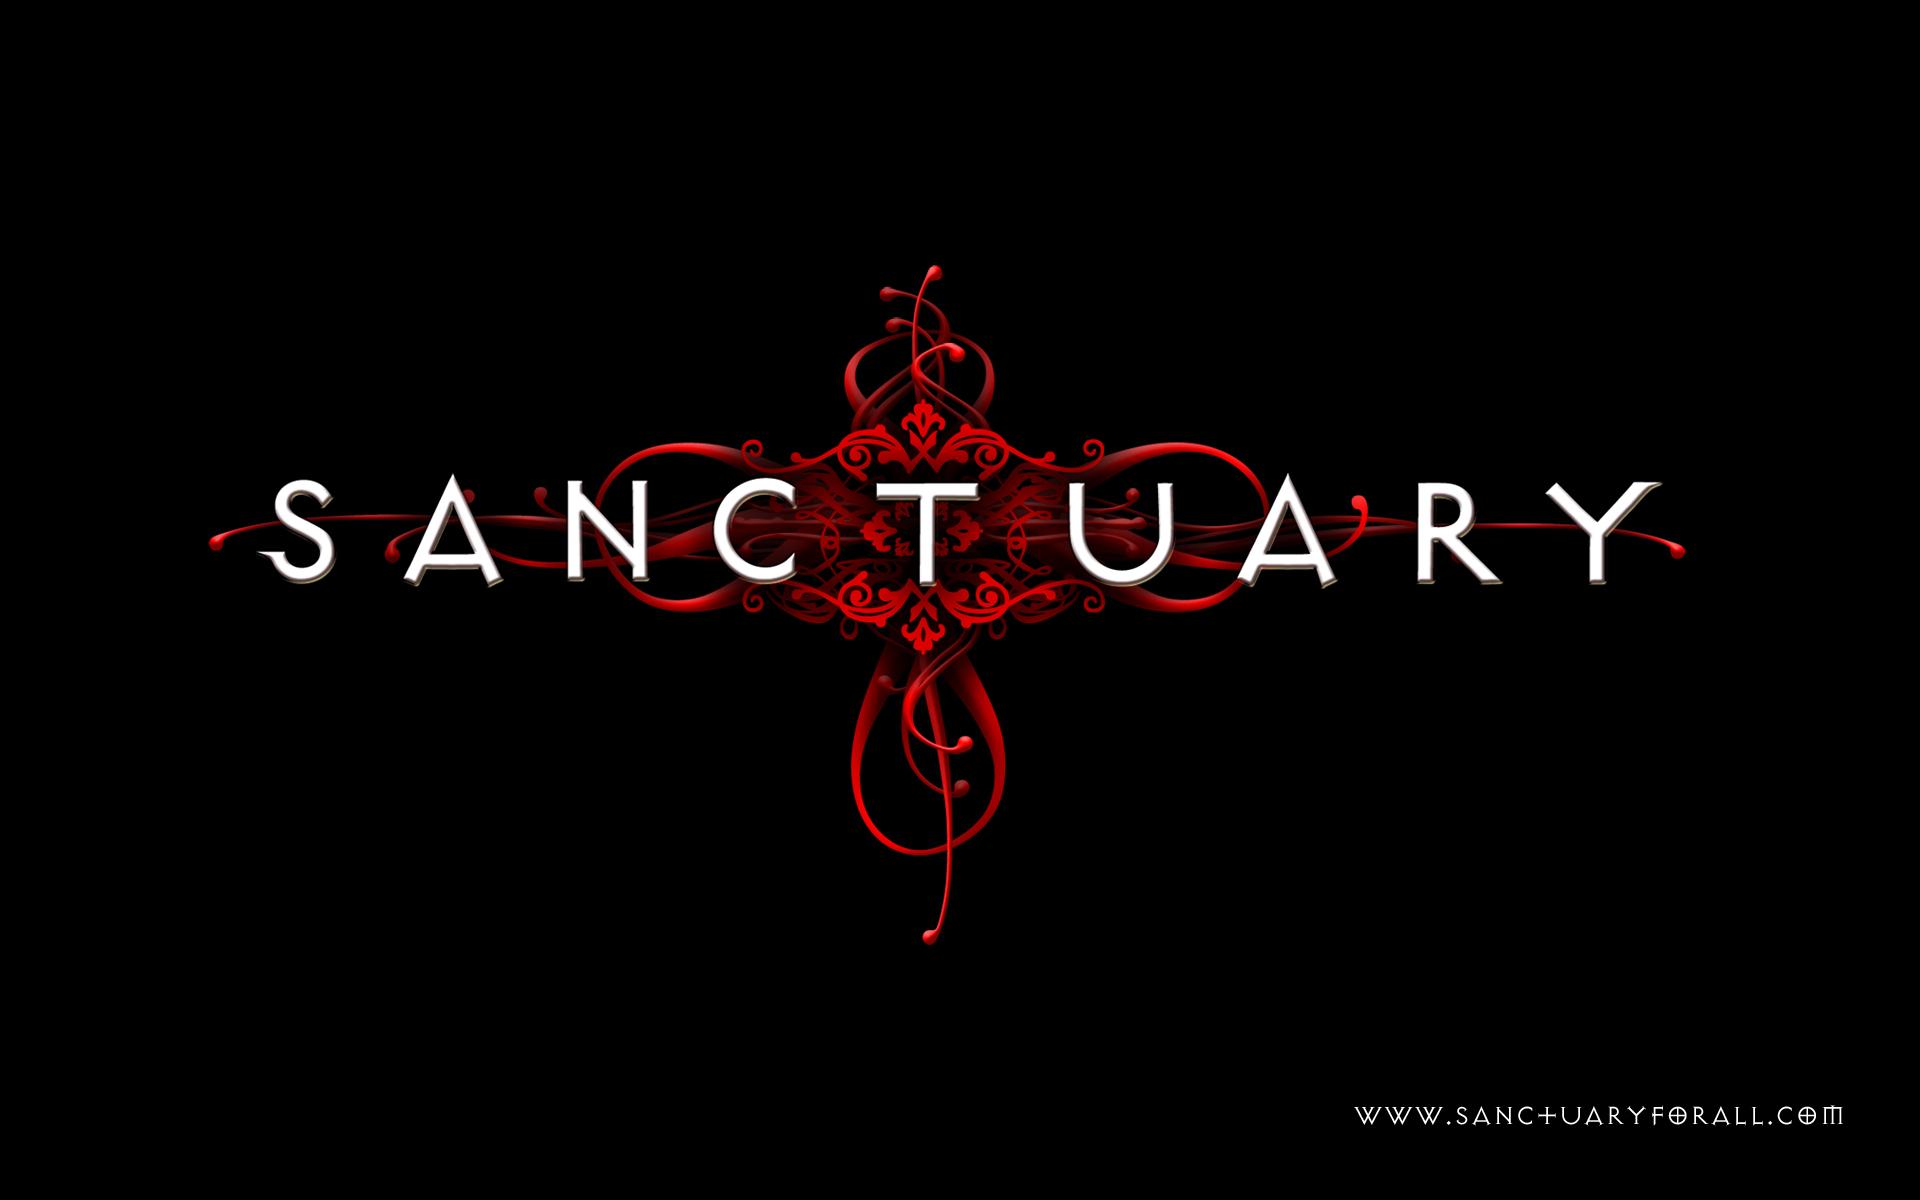 http://superiorrealities.files.wordpress.com/2011/10/sanctuary-sanctuary-9138640-1920-1200.jpg